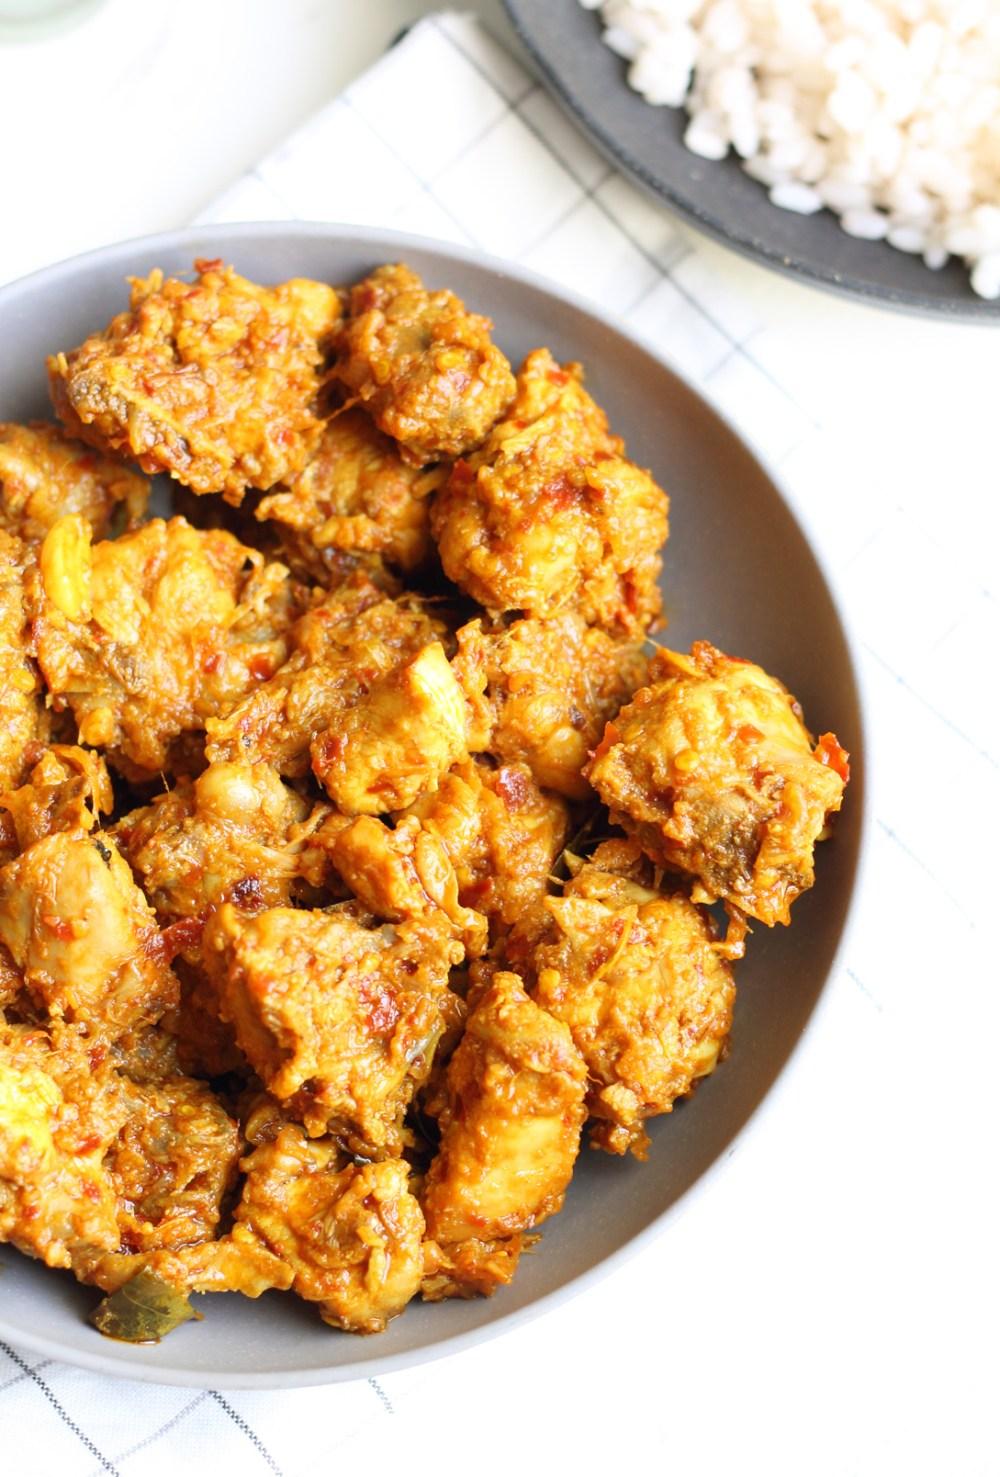 Malabar special Thari Kozhi Recipe